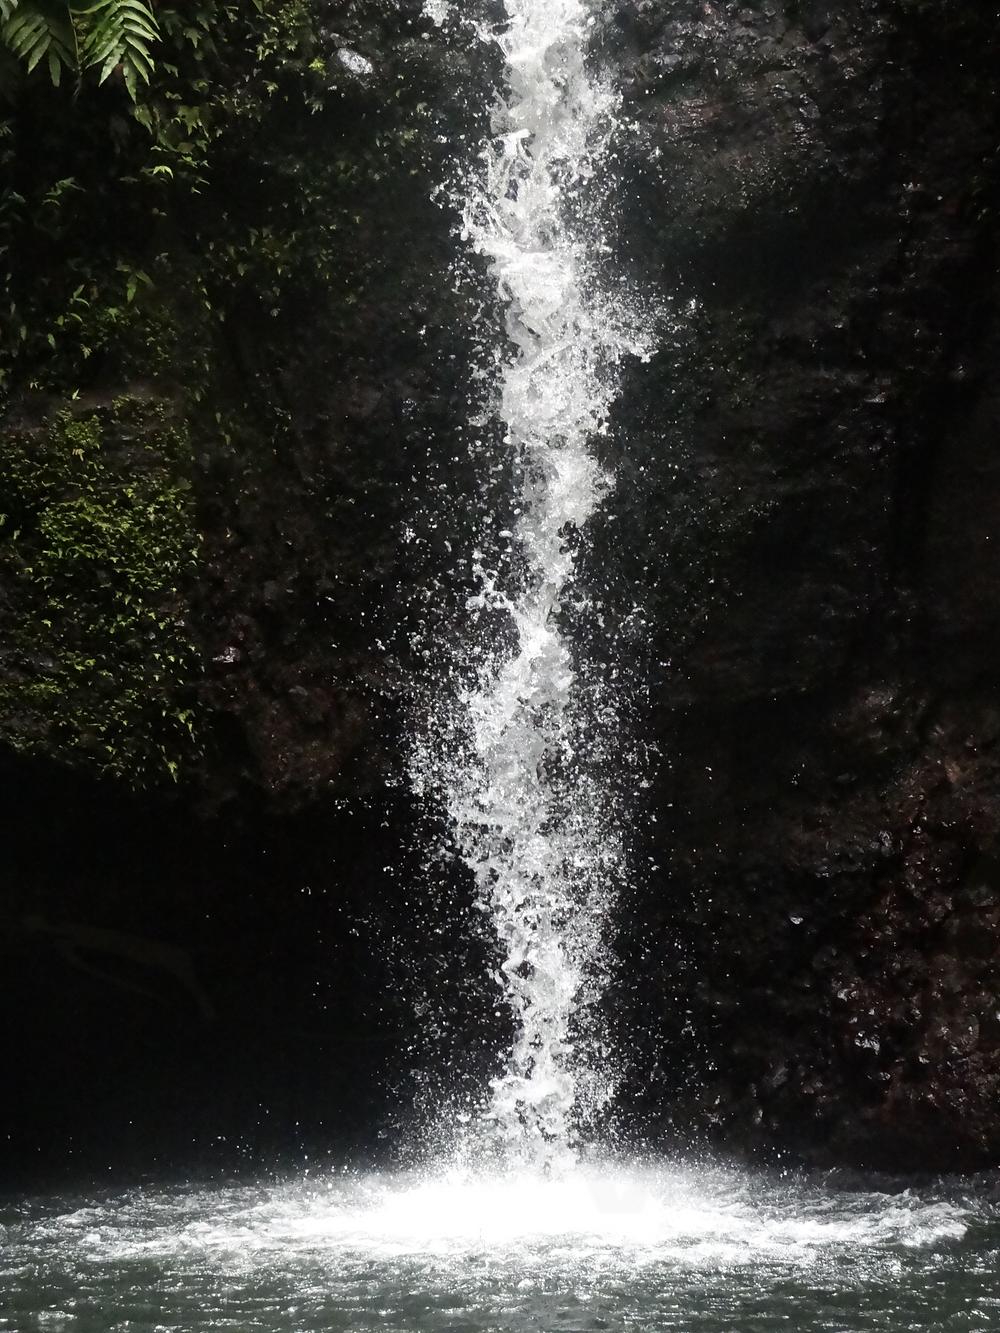 Eau cascade tambour chute guadeloupe sentier randonnée de la cascade tambour